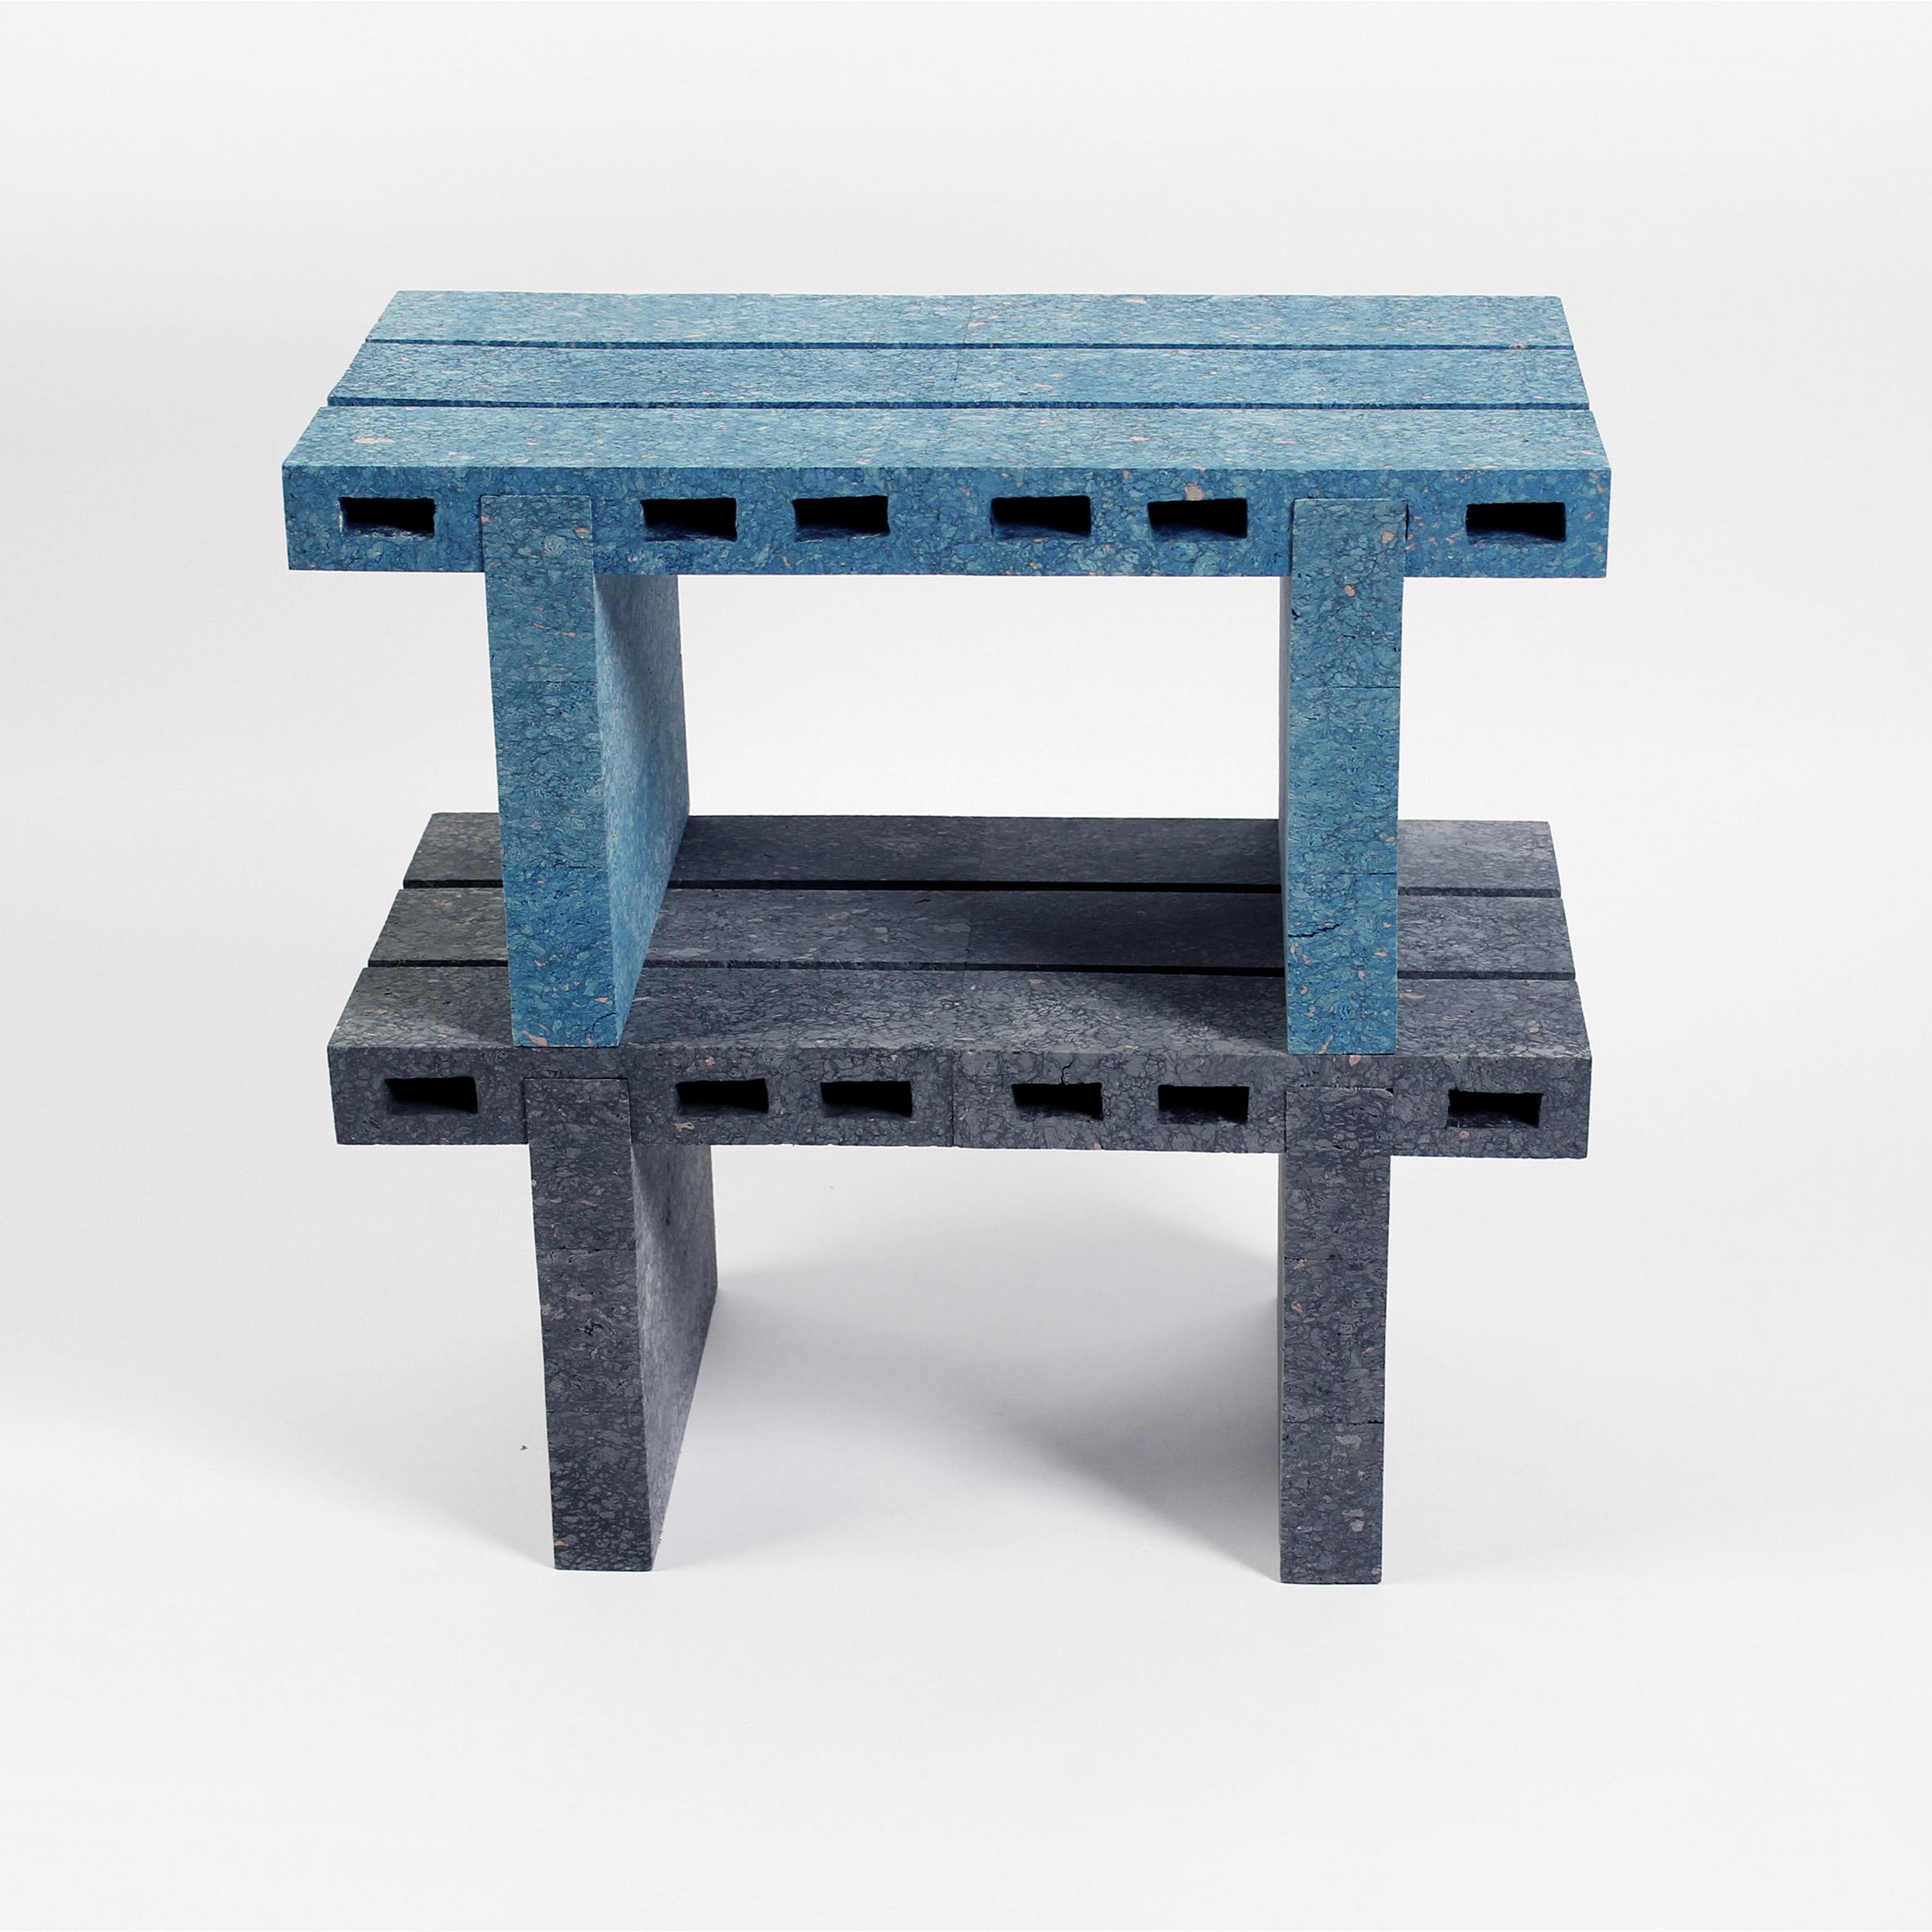 paper-bricks-woo-jai-lee-furniture-sustainable-design-furniture-dutch-design-week_dezeen_2364_col_7